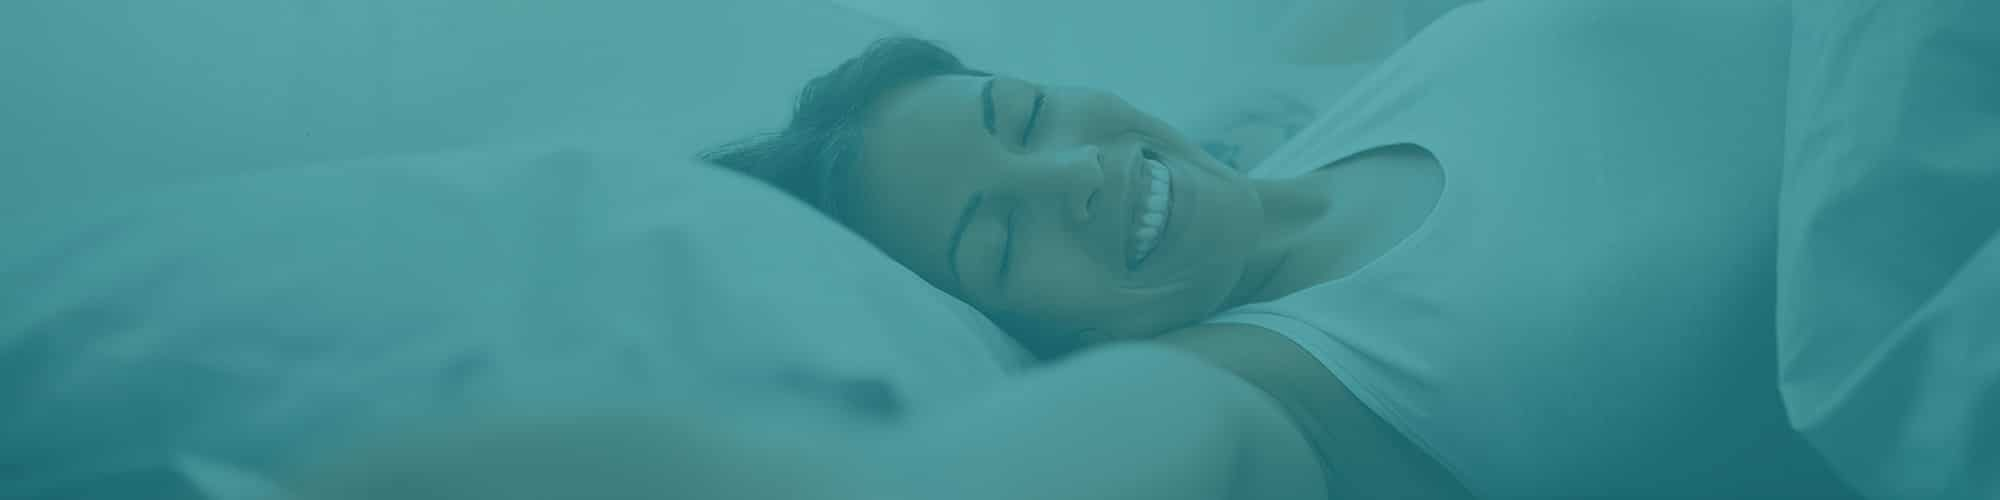 Keep your heart healthy: 3 scientific sleep tips for a good night's sleep